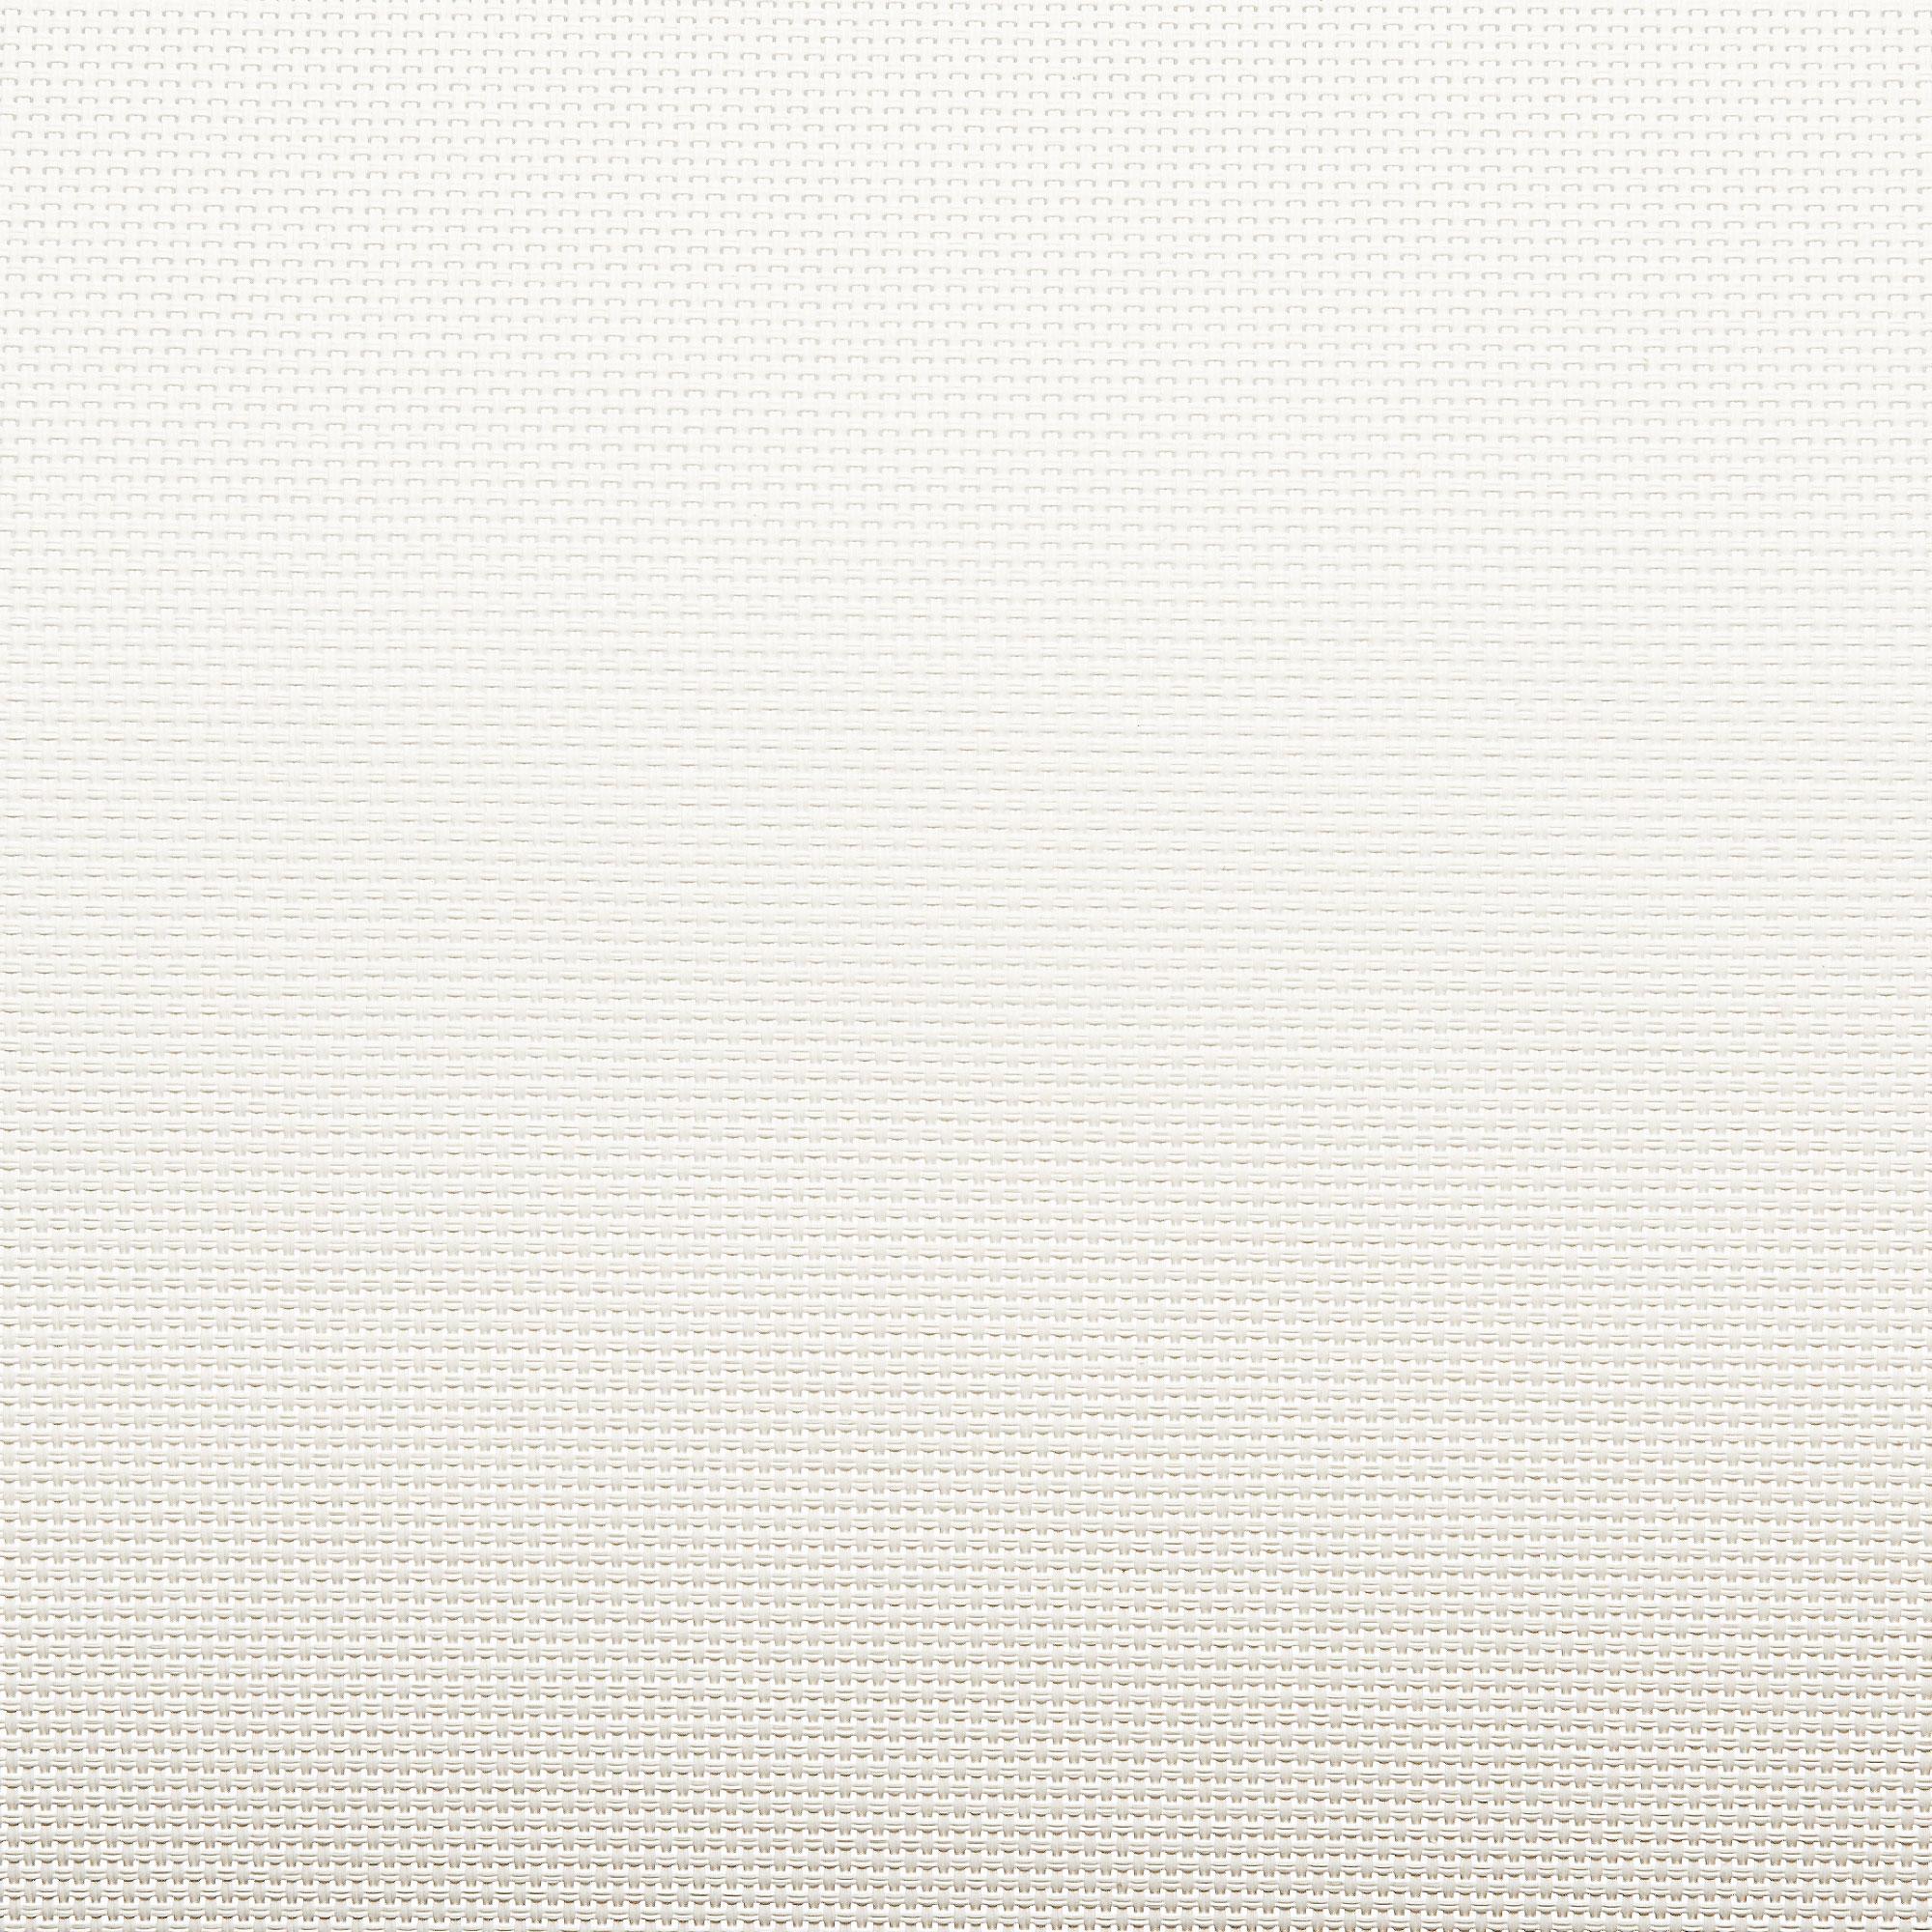 swatch-4000-p06-chalk-web.jpg